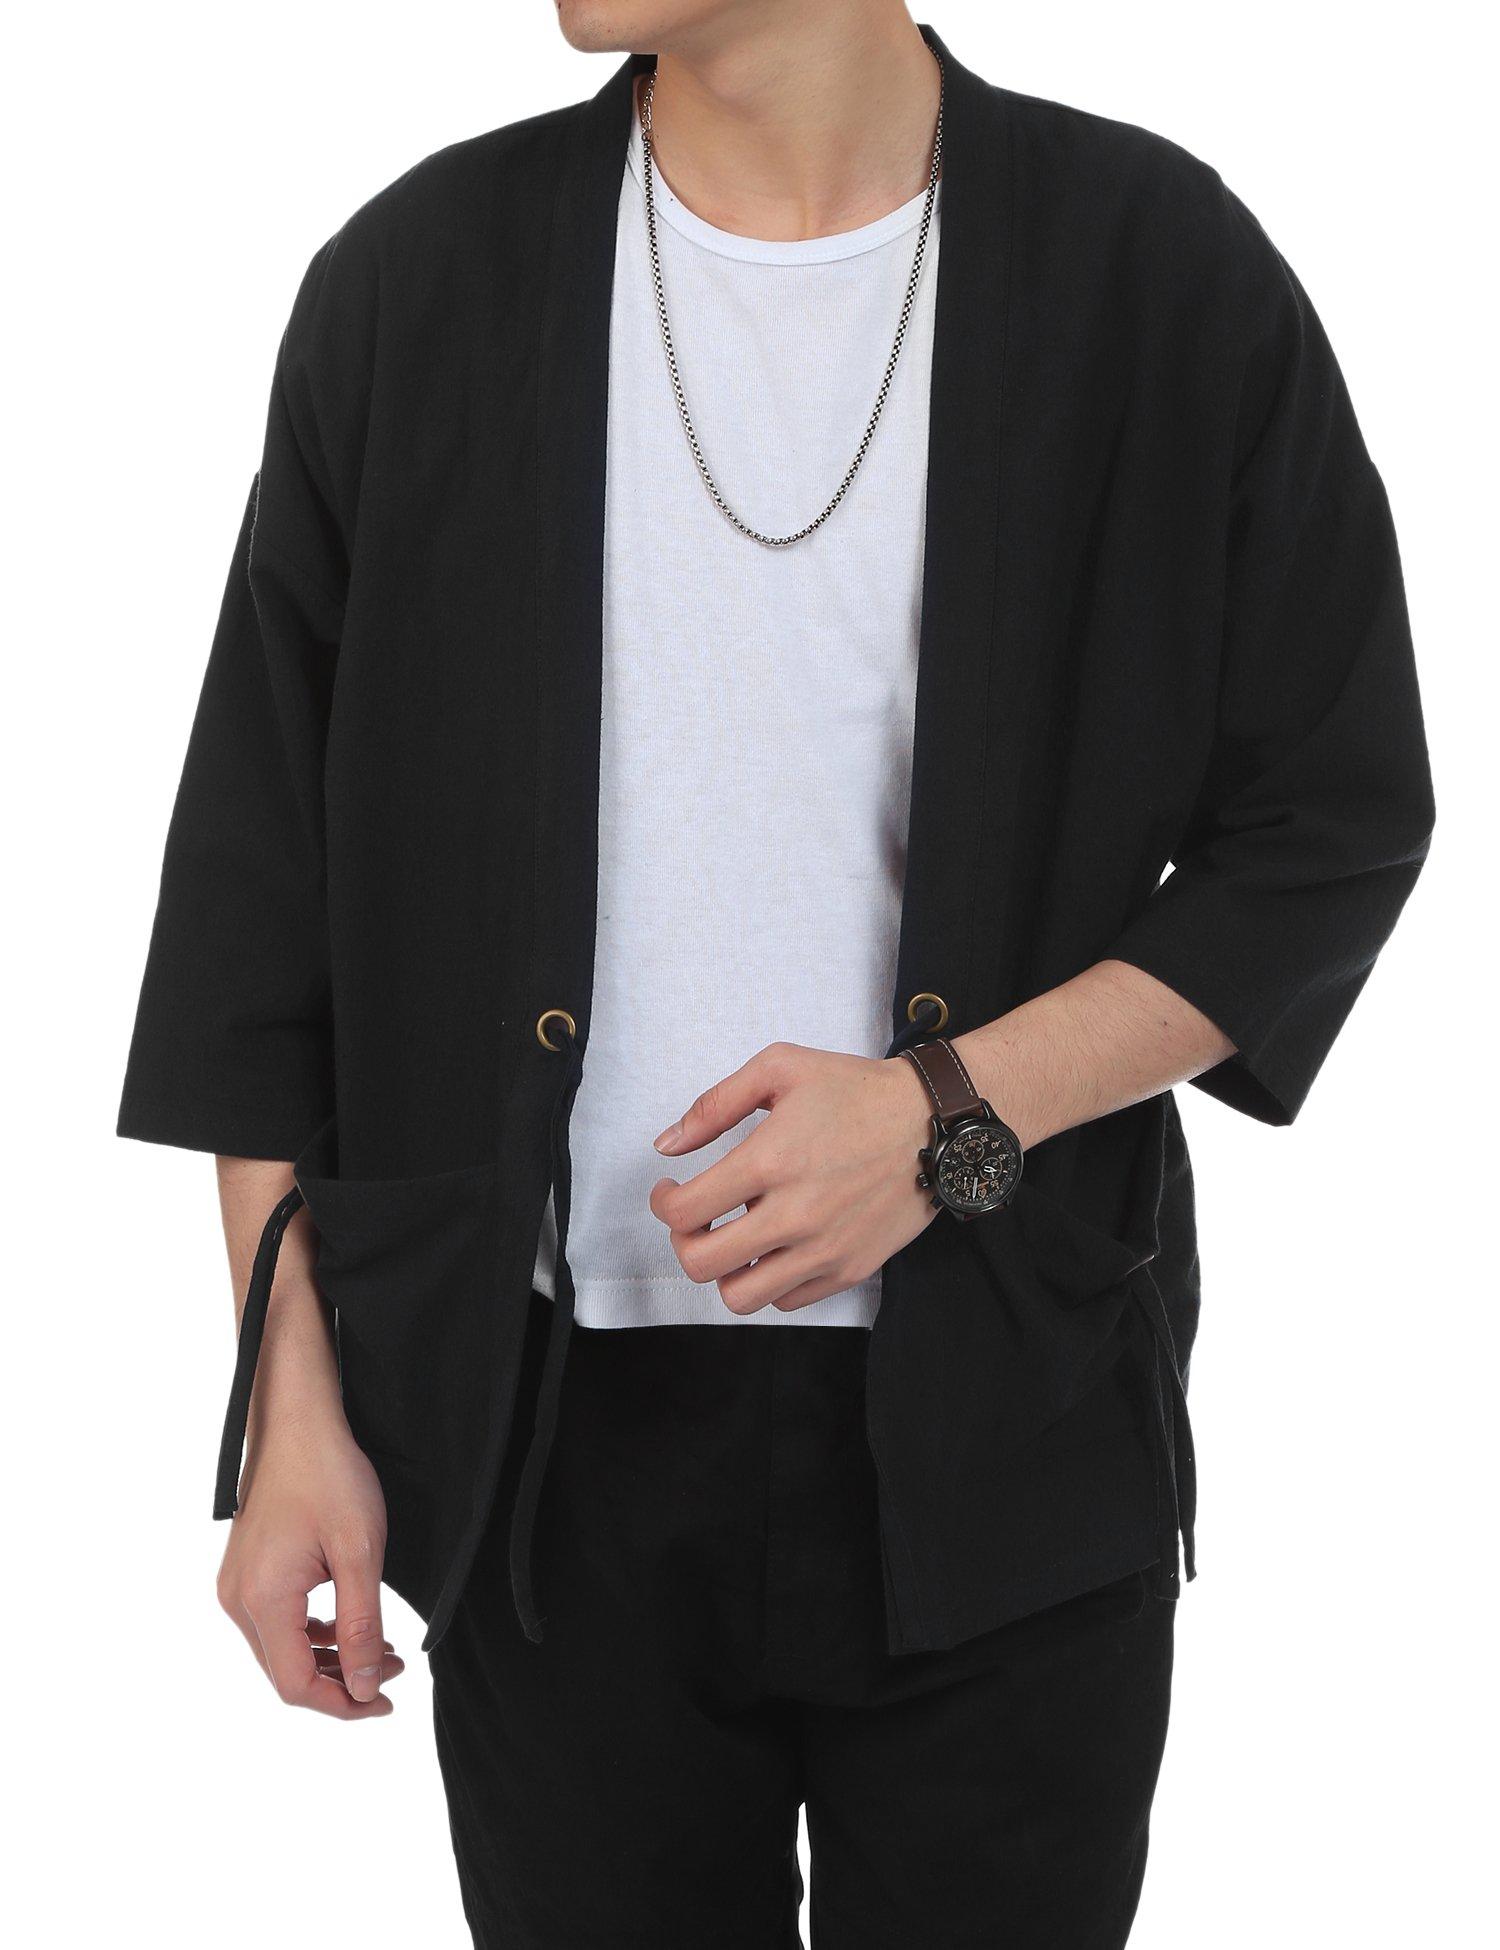 COOFANDY Men's Lightweight Cotton Linen Blend Jacket Vintage Cloak Open Front Cardigan,Black,Small(US S)